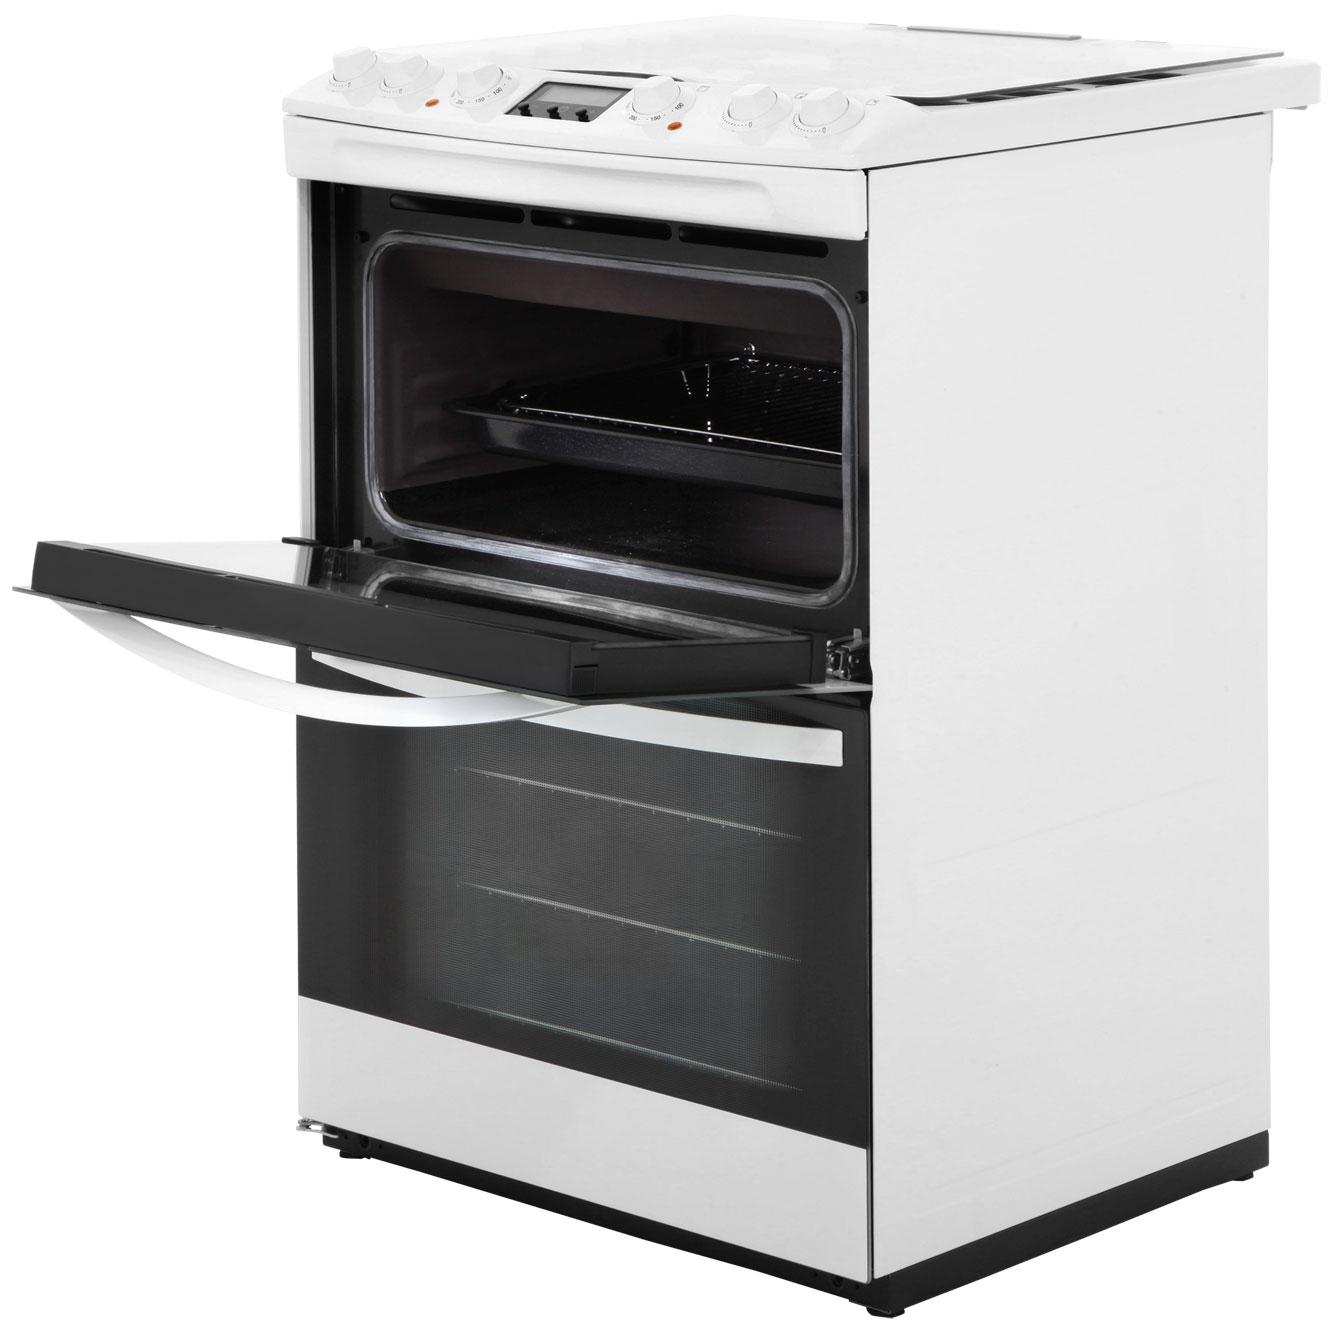 Uncategorized Zanussi Kitchen Appliances zck68300b bk zanussi dual fuel cooker black ao com